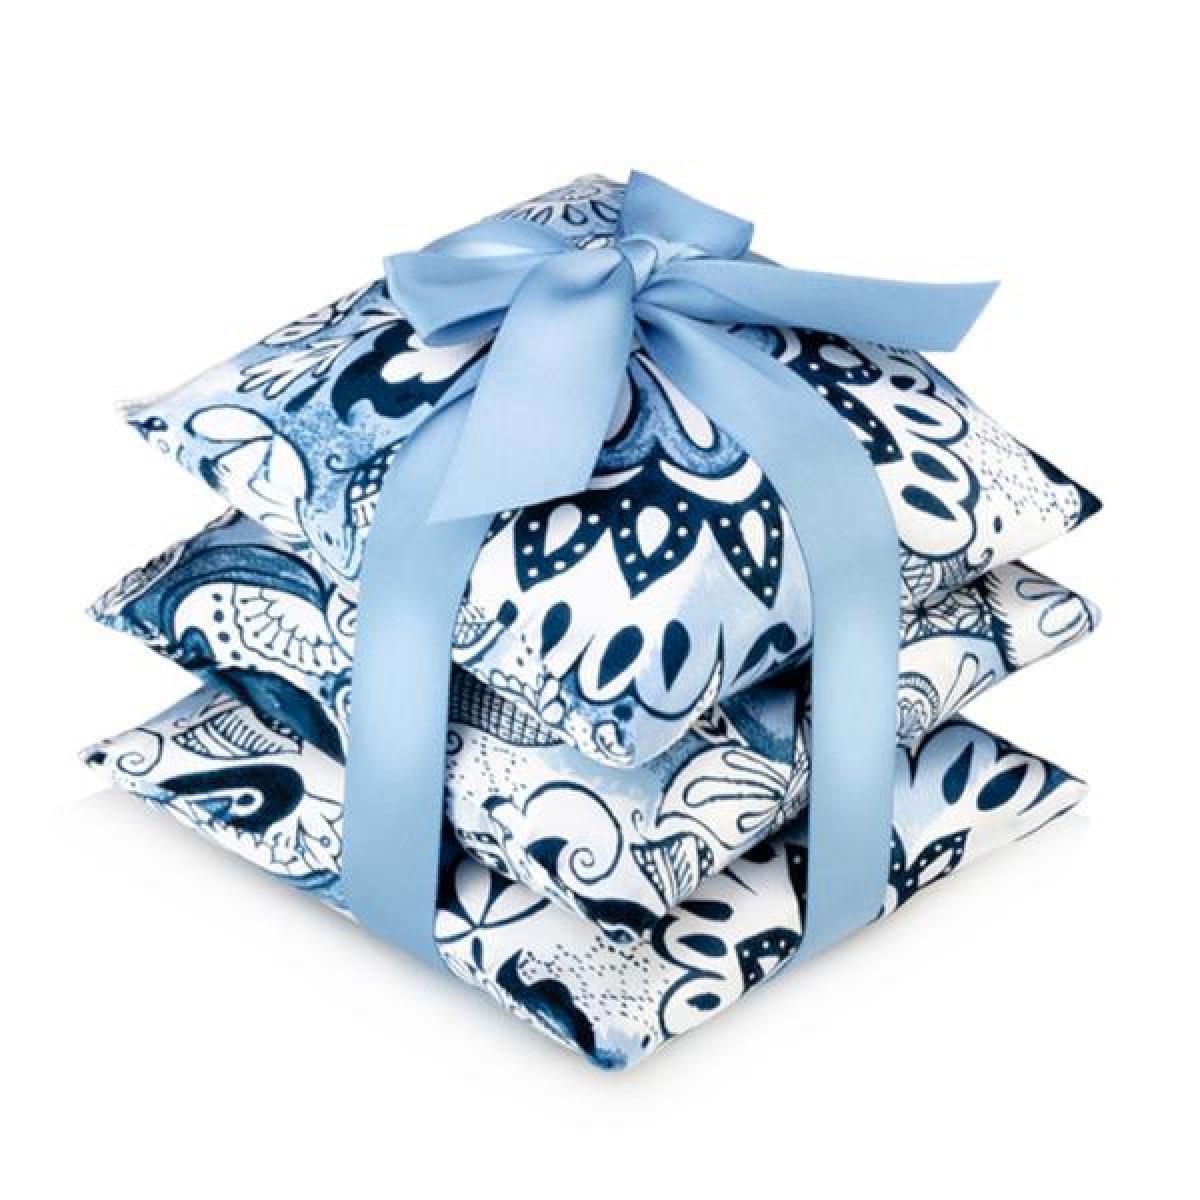 Delft Silk Scented Sachet Set